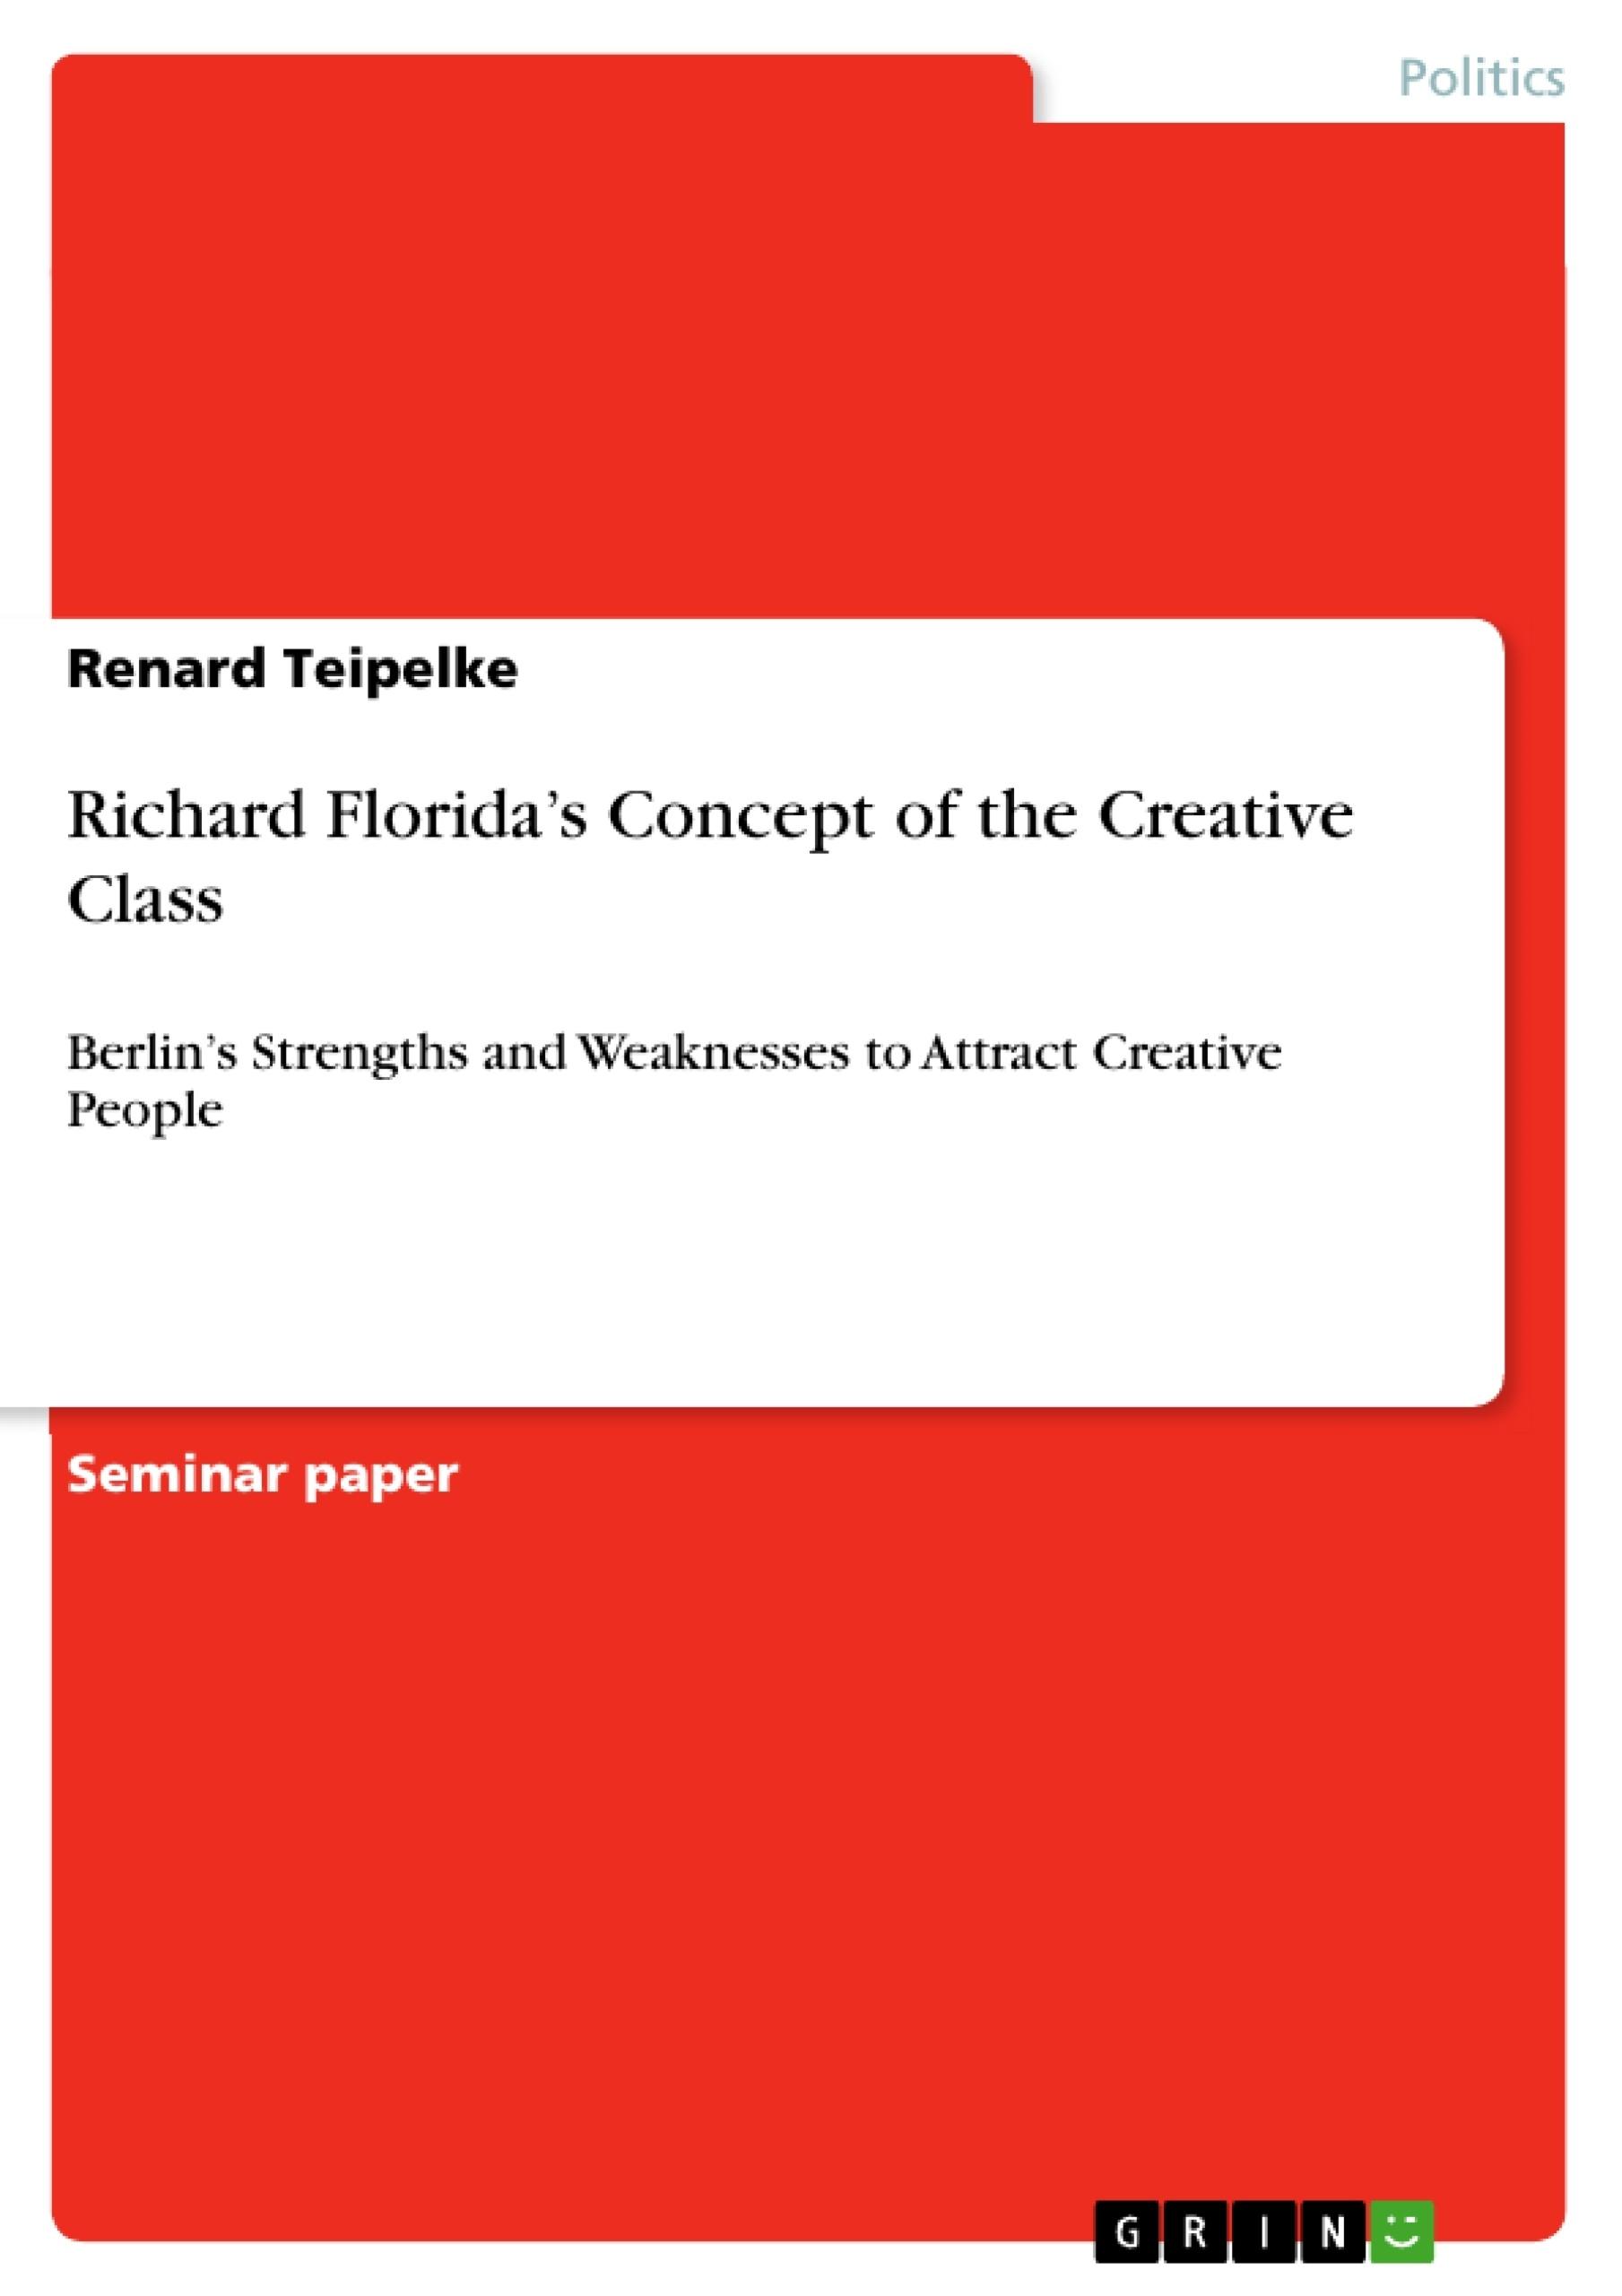 Title: Richard Florida's Concept of the Creative Class